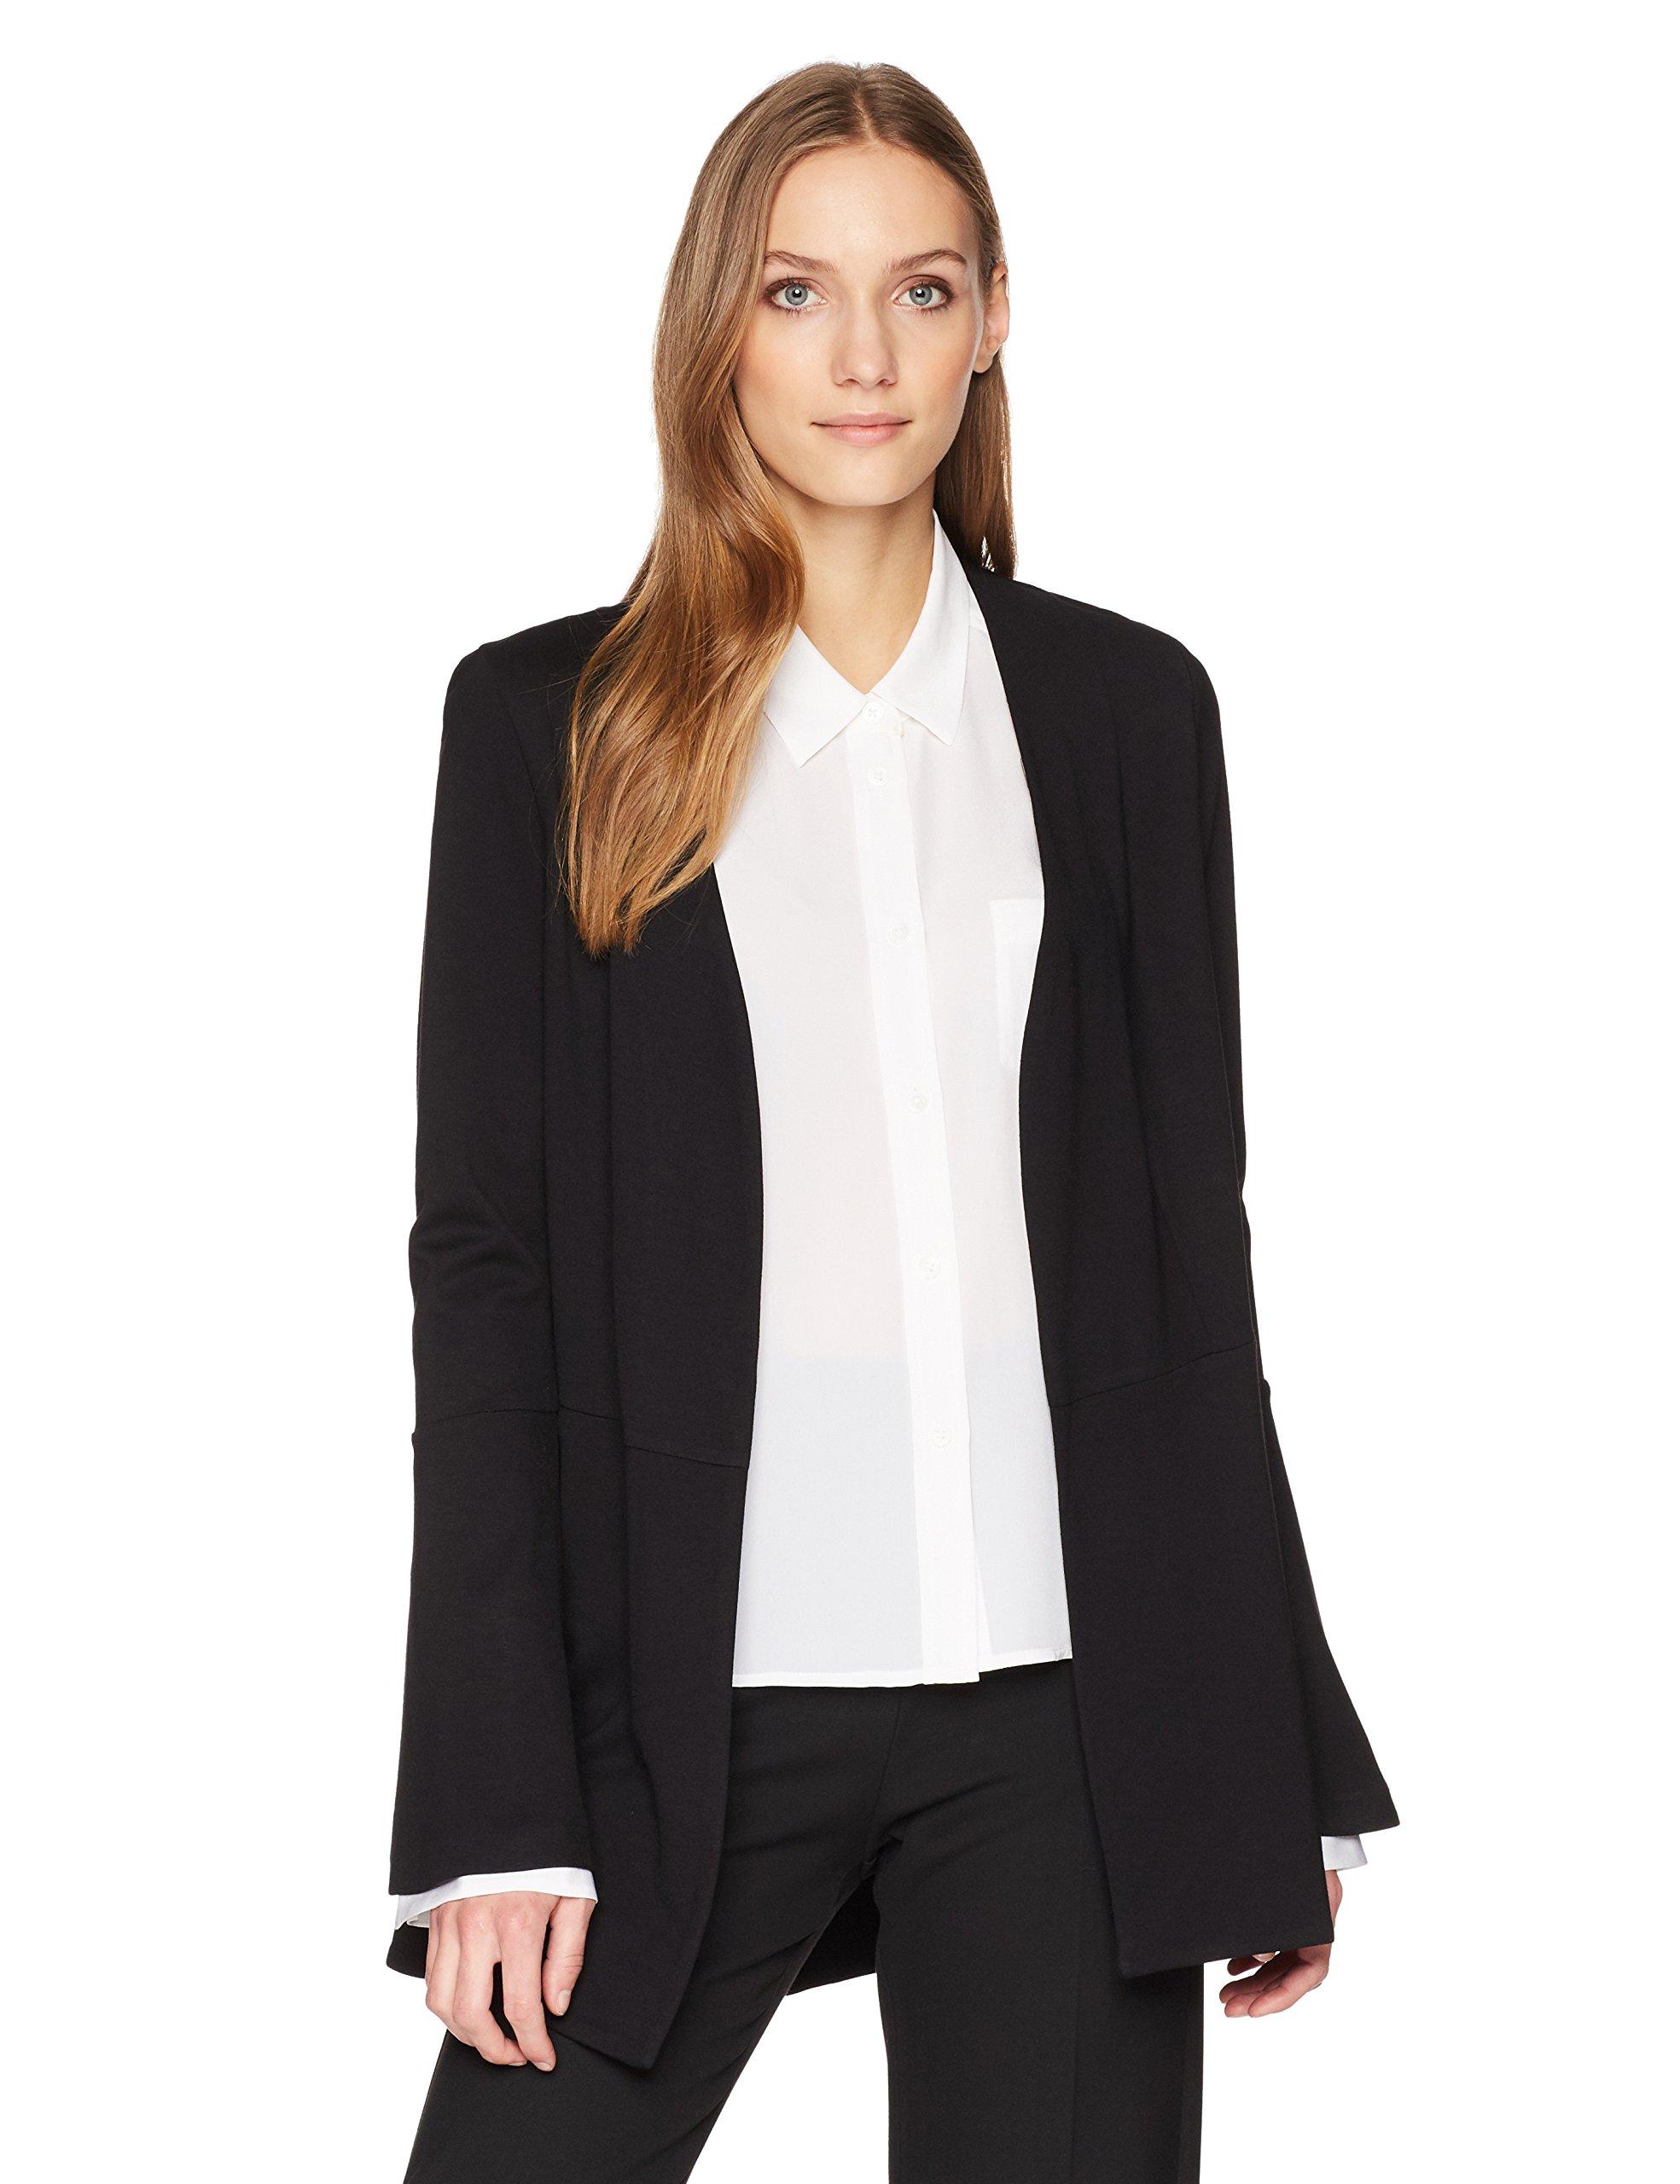 Lyssé Women's Macklin Ponte Jacket, Black, S